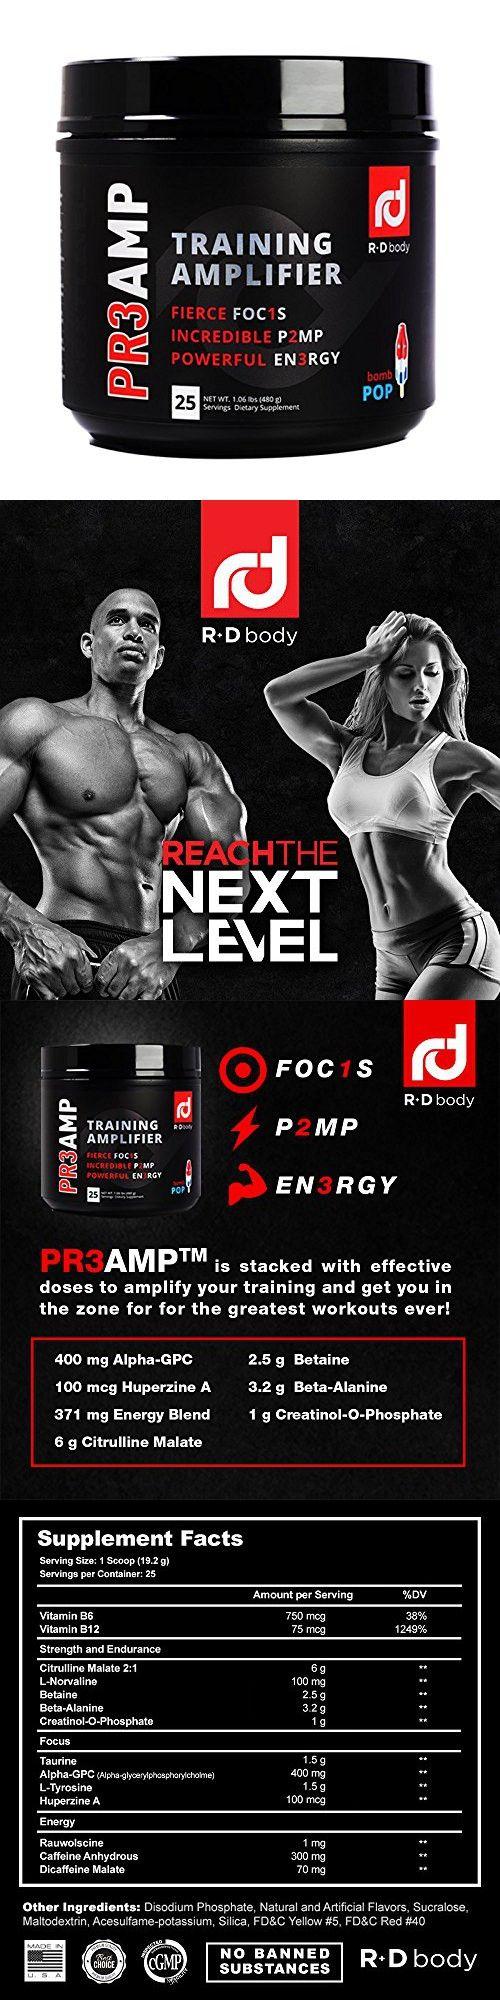 PR3AMP Pre Workout - The Best Pre Workout Supplement - Preworkout Training Amplifier - Orange Crush - R D Body Pre Workout (25 Servings) (Bomb Pop)